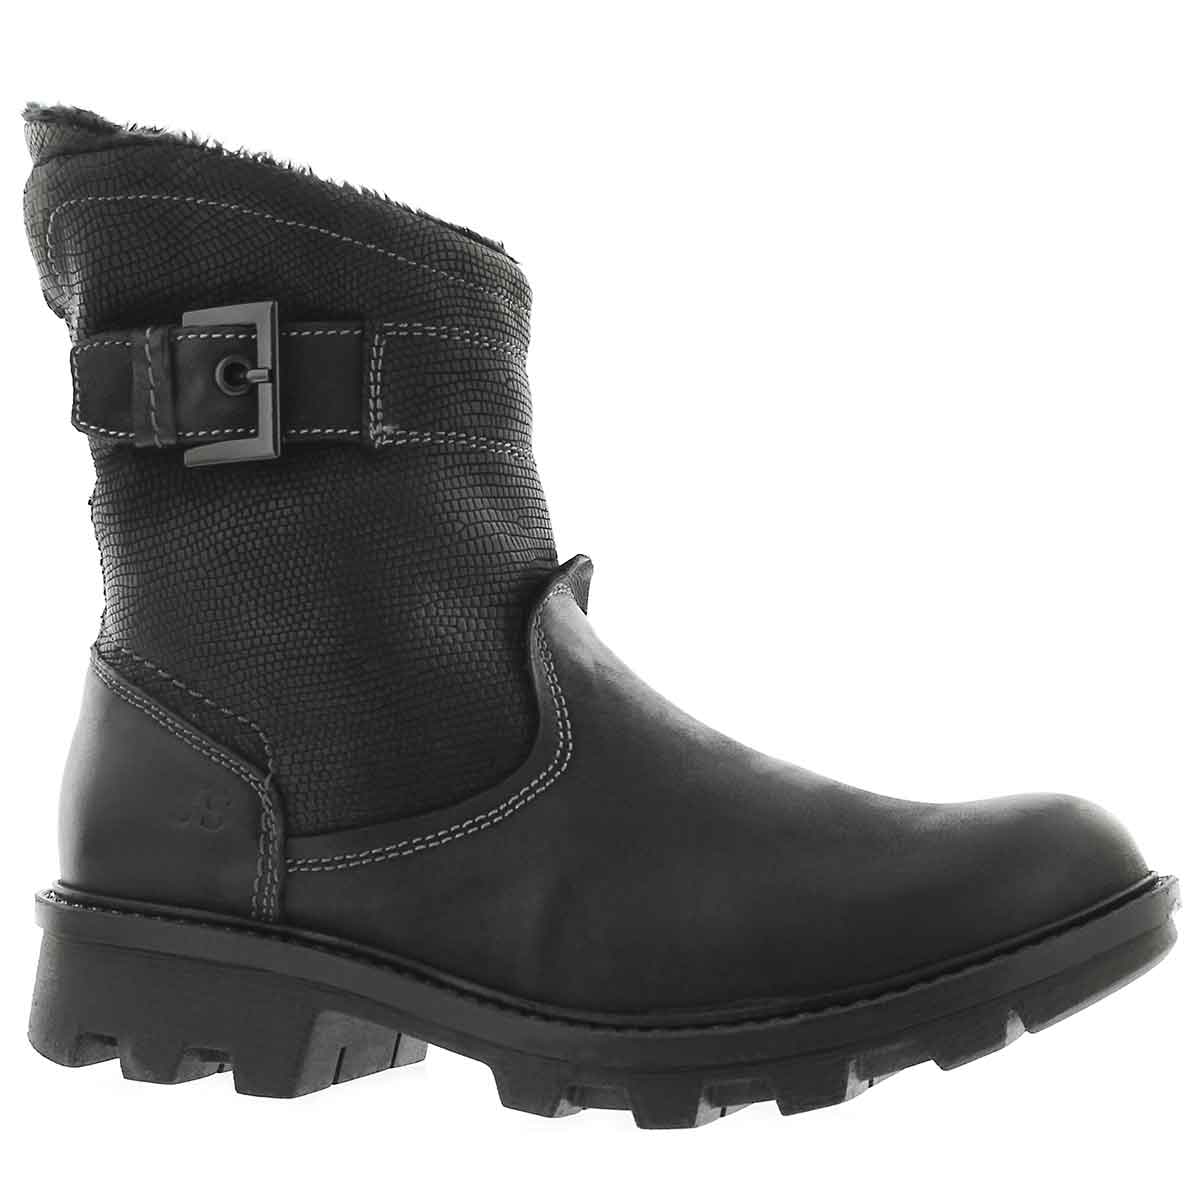 Women's MARILYN 09 schwarz short midcalf boots